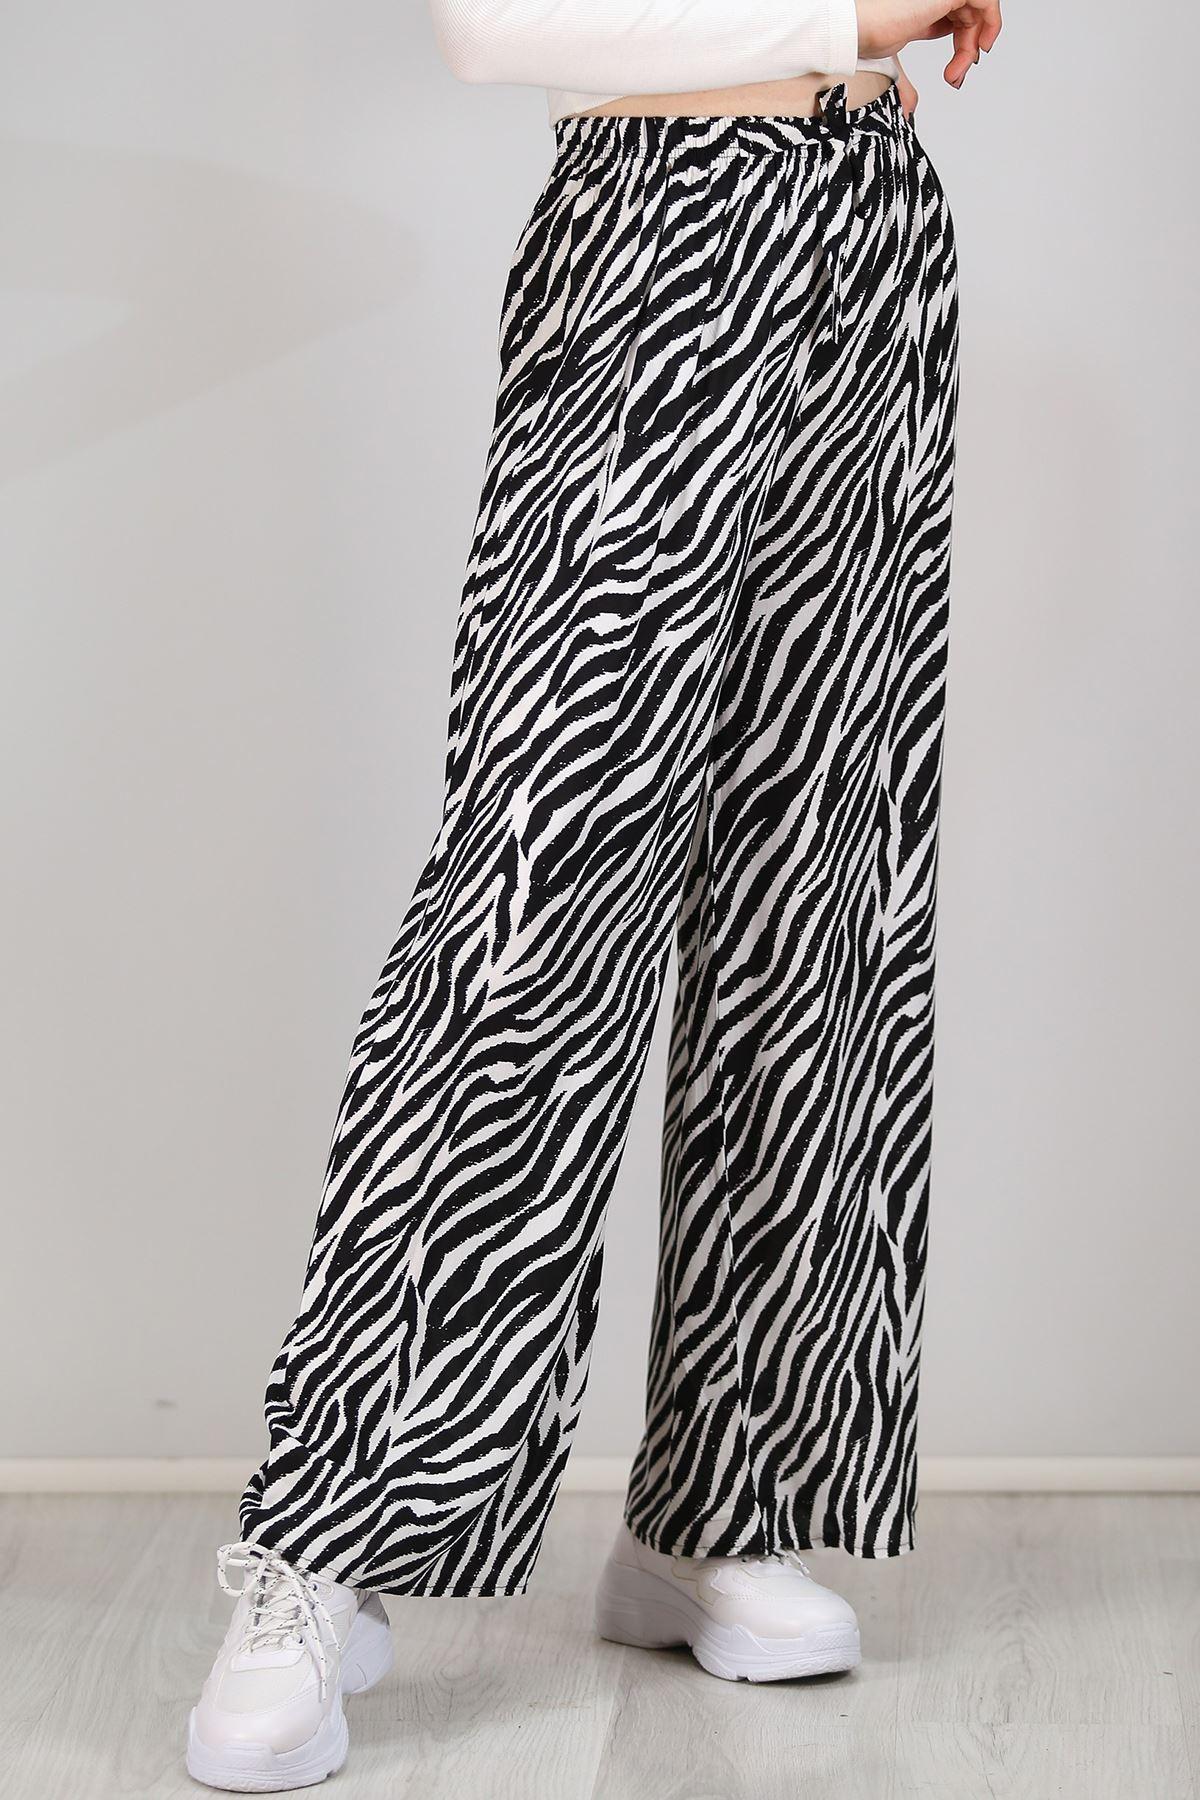 Dokuma Pantolon Zebra - 1233.1095.